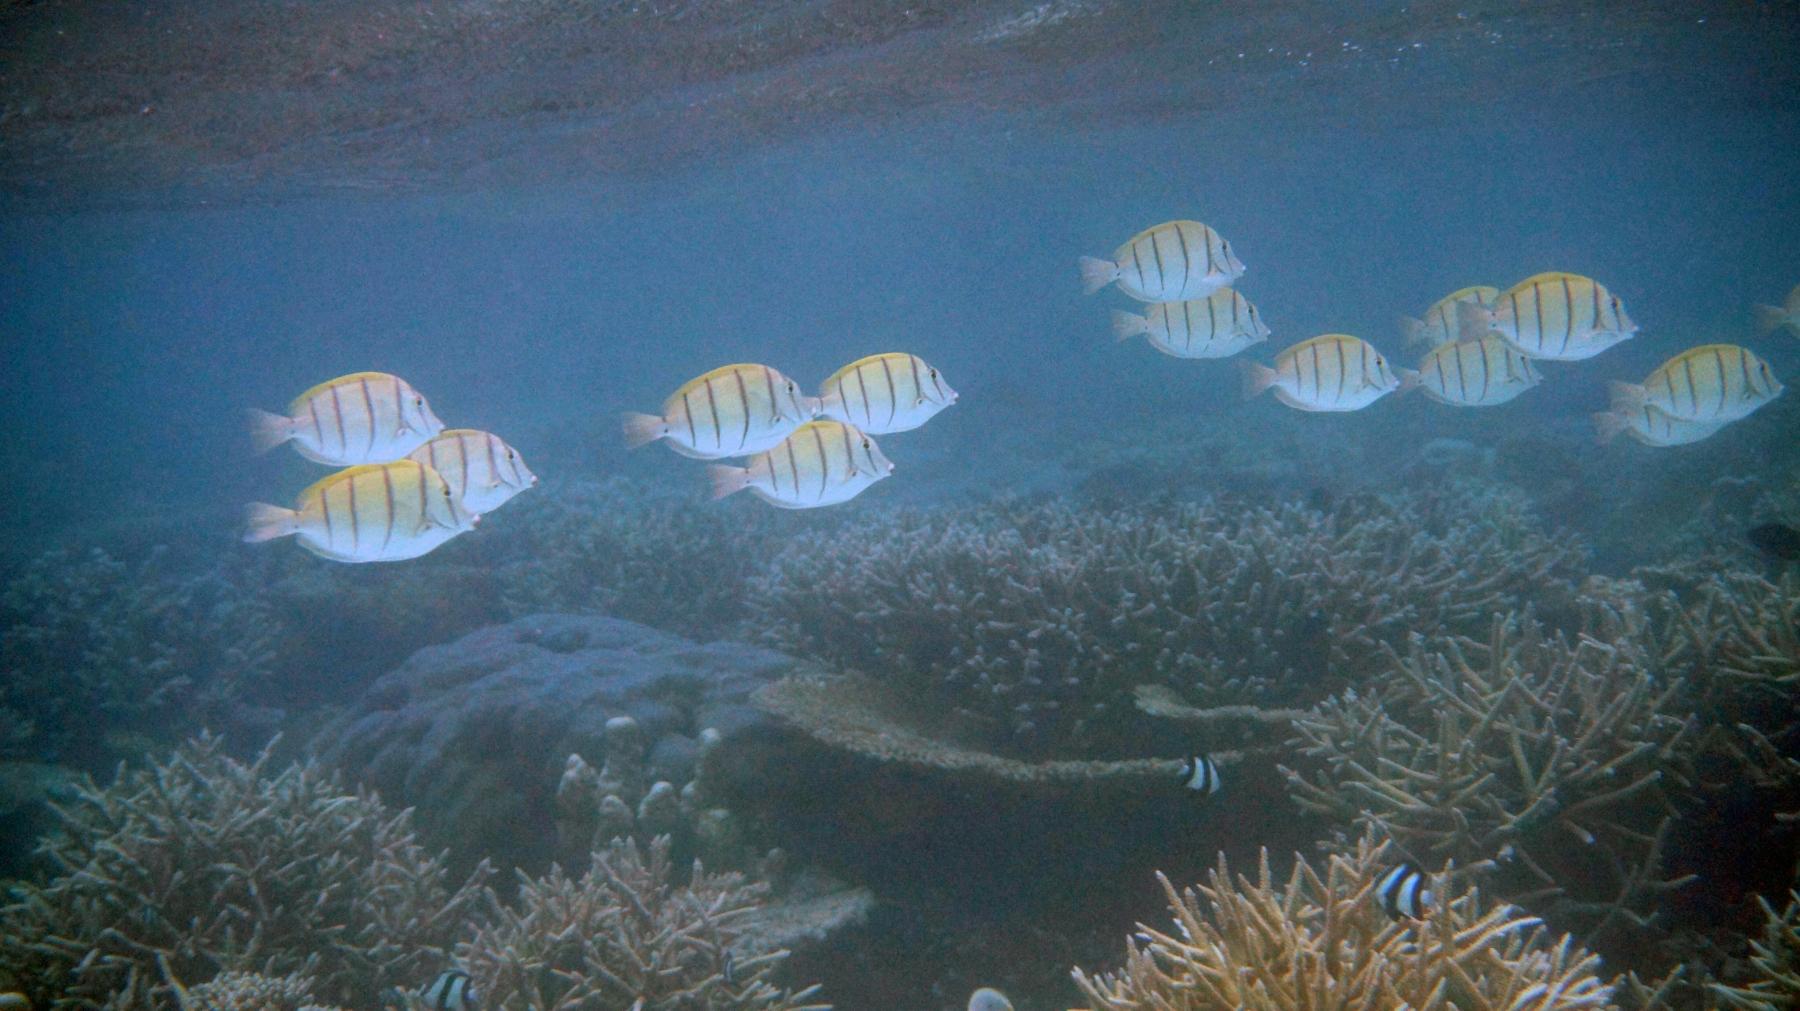 Acanthurus_triostegus_002_C_Peces-Cirujano_L_Maldivas_U_Sebas_29062015